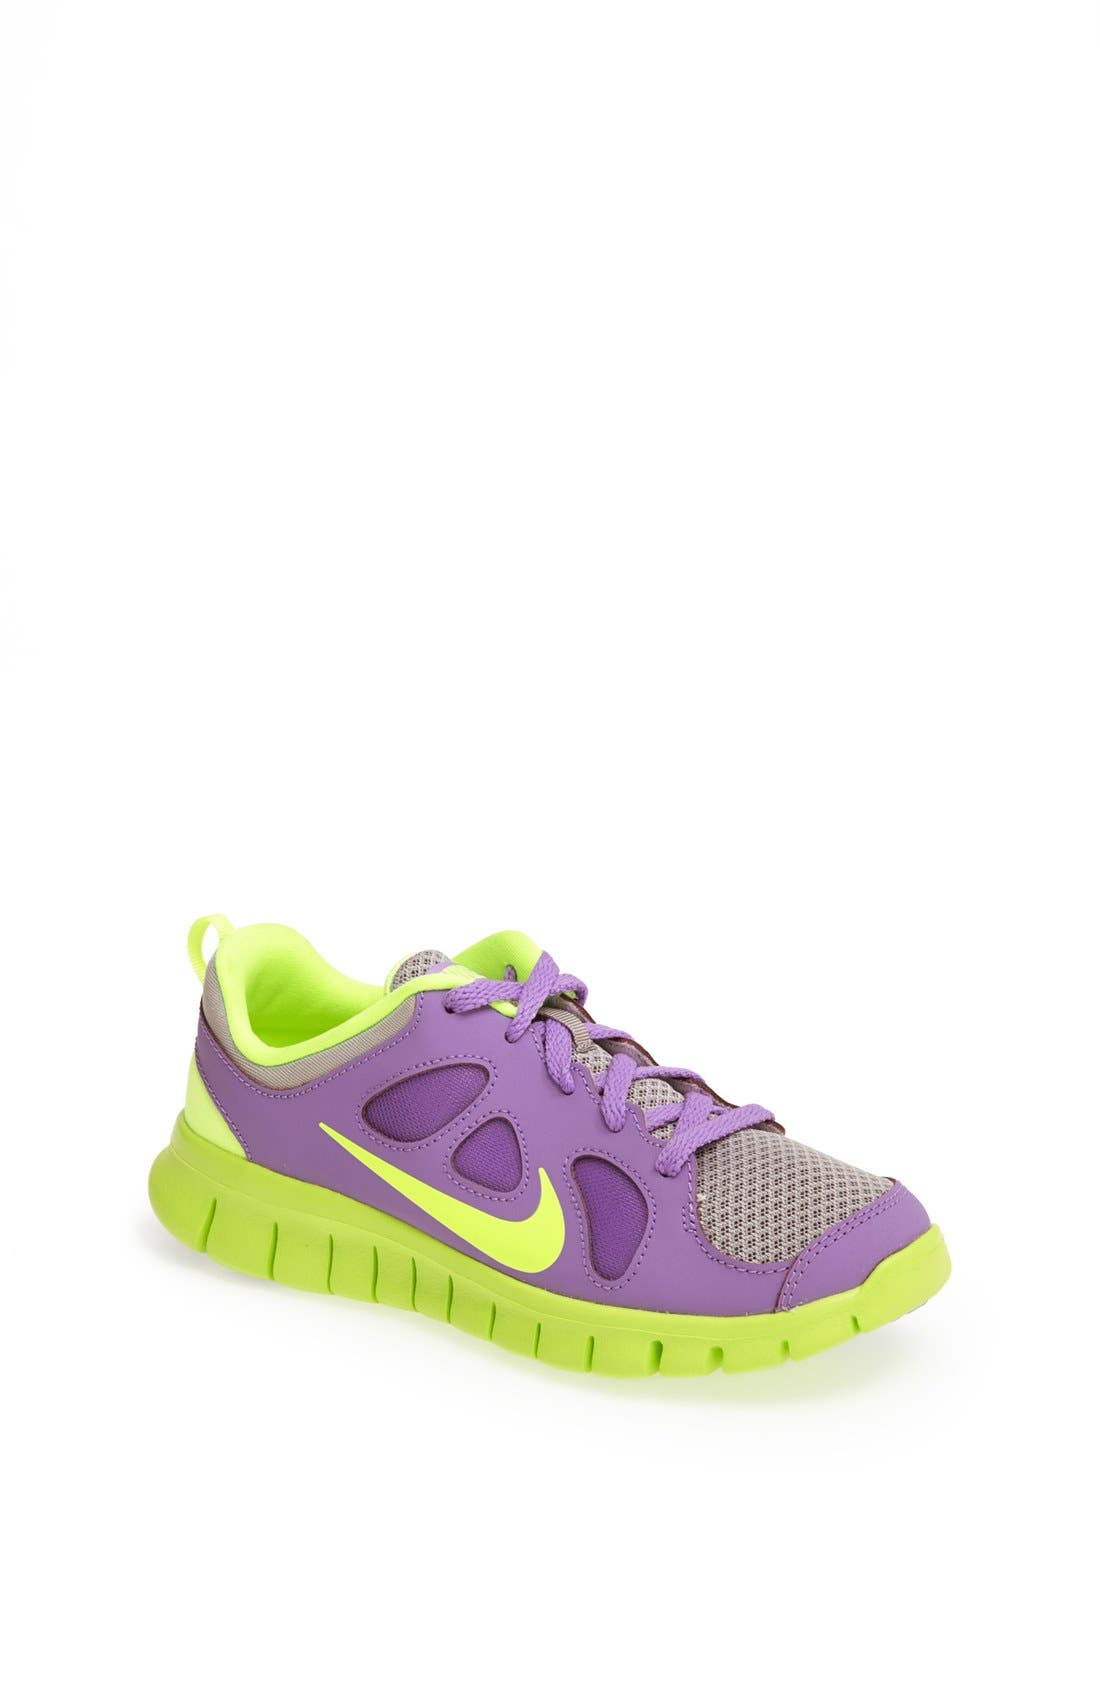 'Free Run 5.0' Running Shoe,                             Main thumbnail 1, color,                             Atomic Violet/ Volt/ White